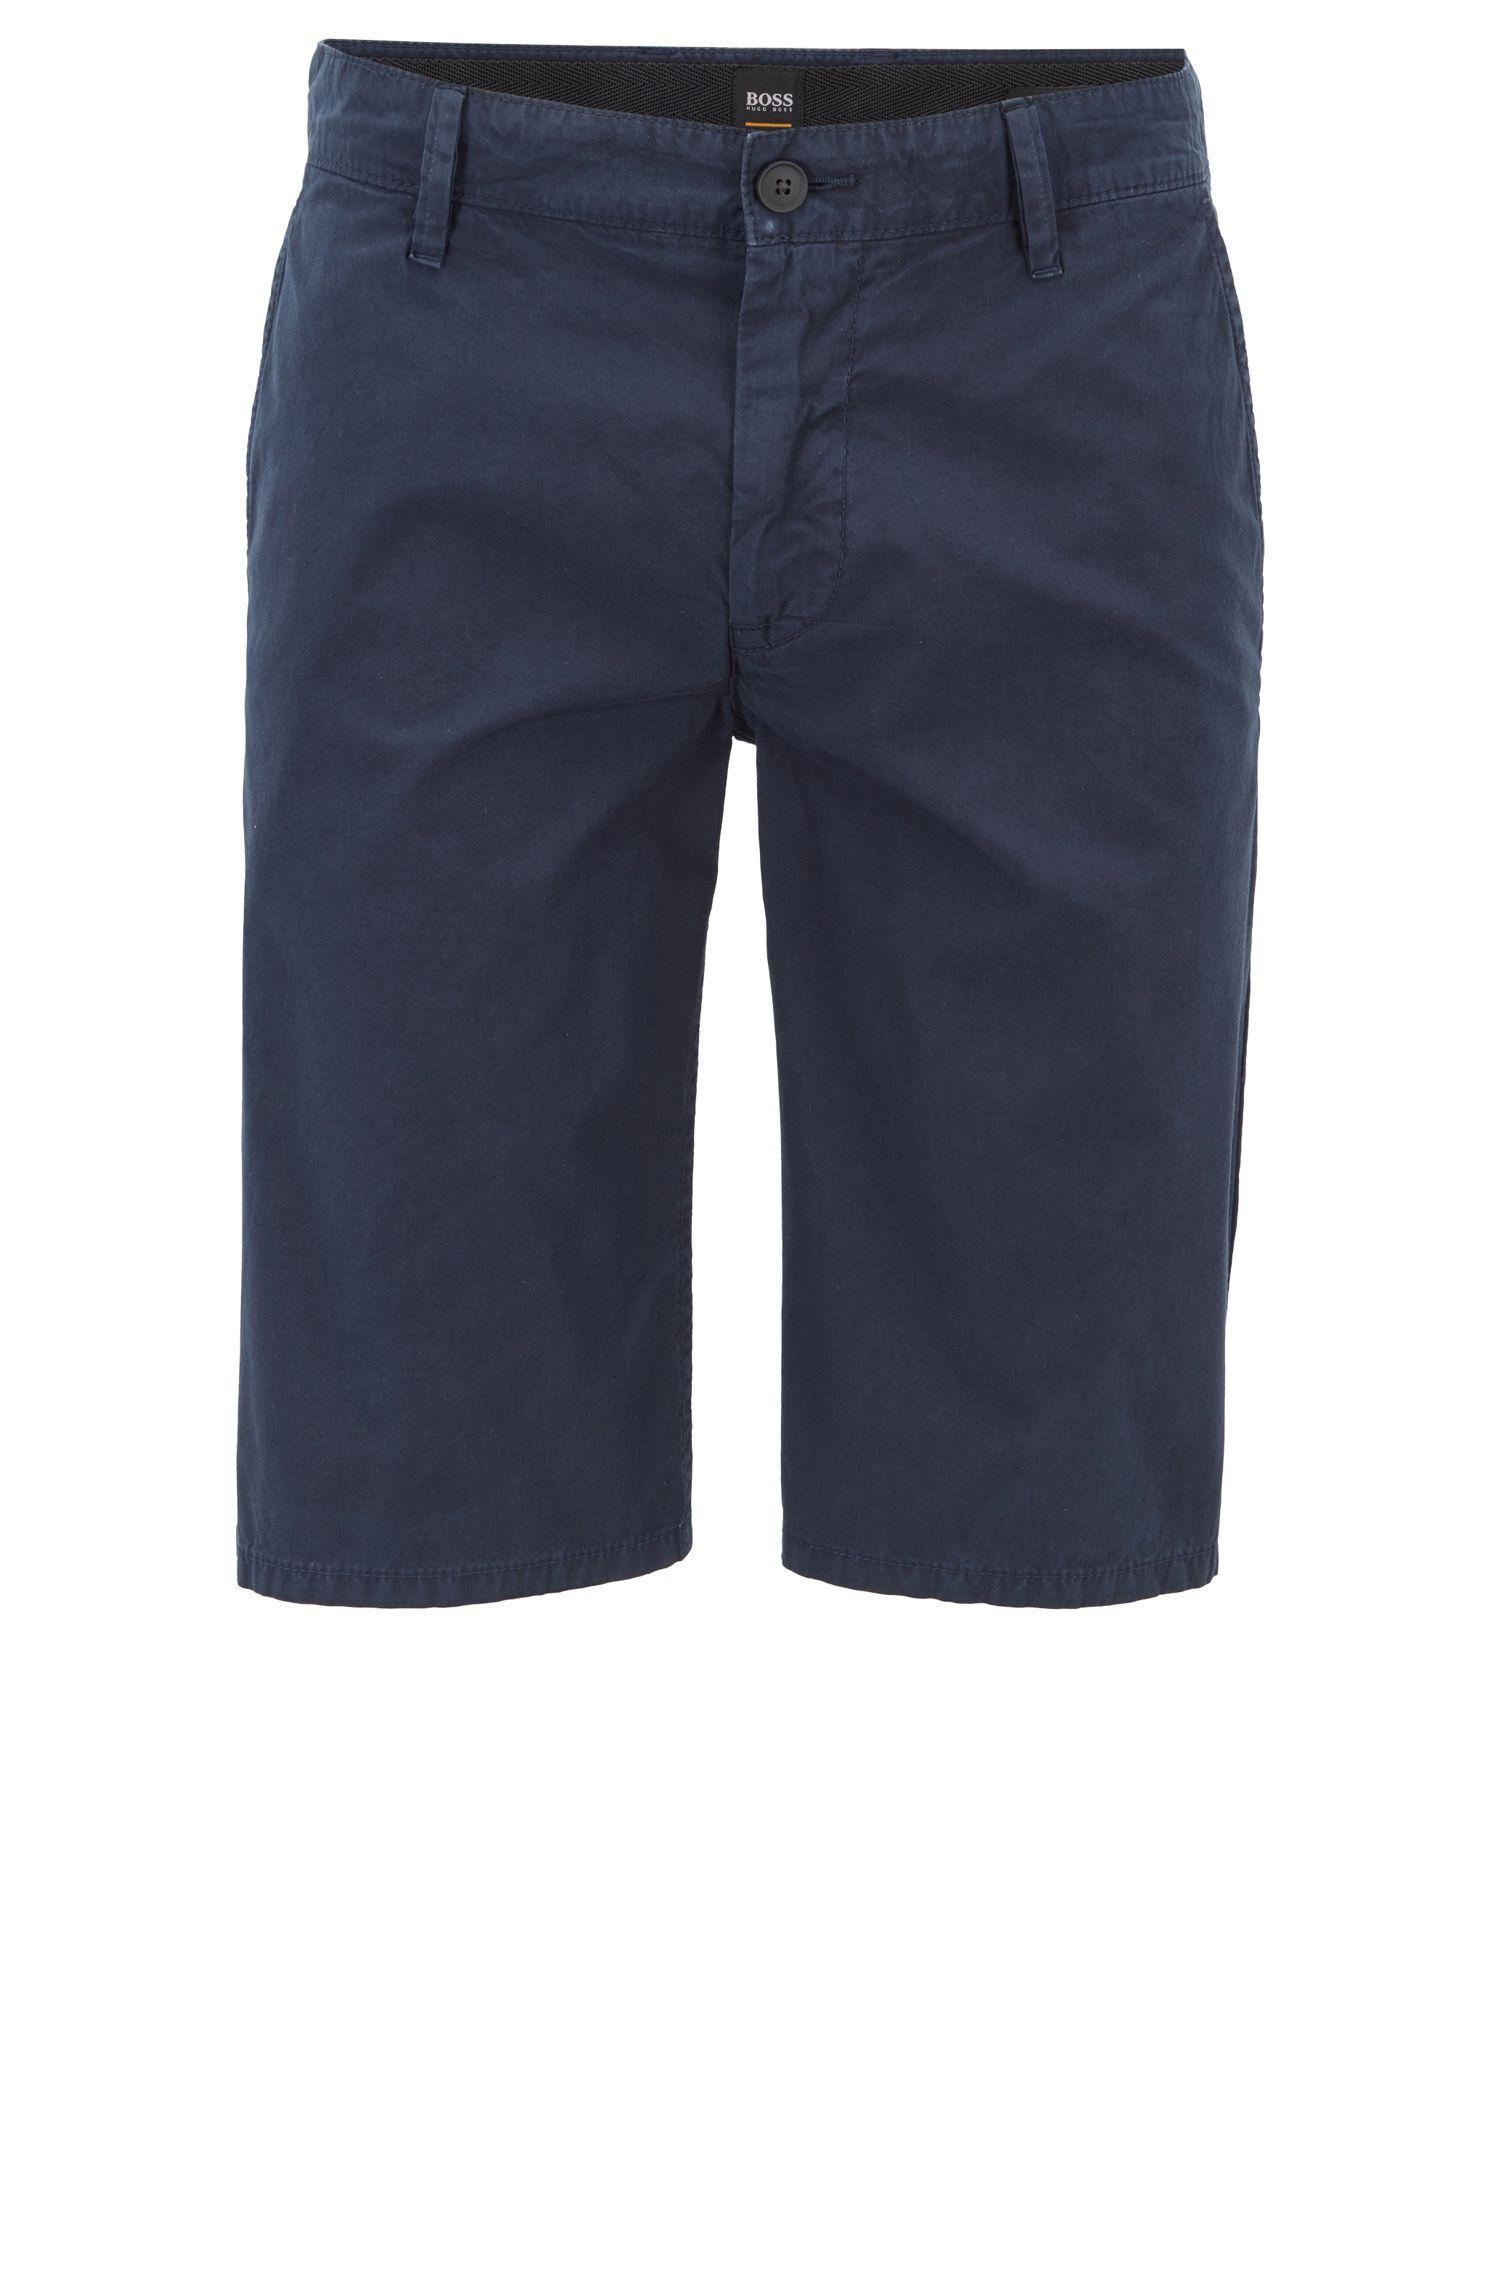 a8ba80e4 BOSS - Blue Regular-fit Reactive-dyed Shorts In Pure Cotton for Men -. View  fullscreen